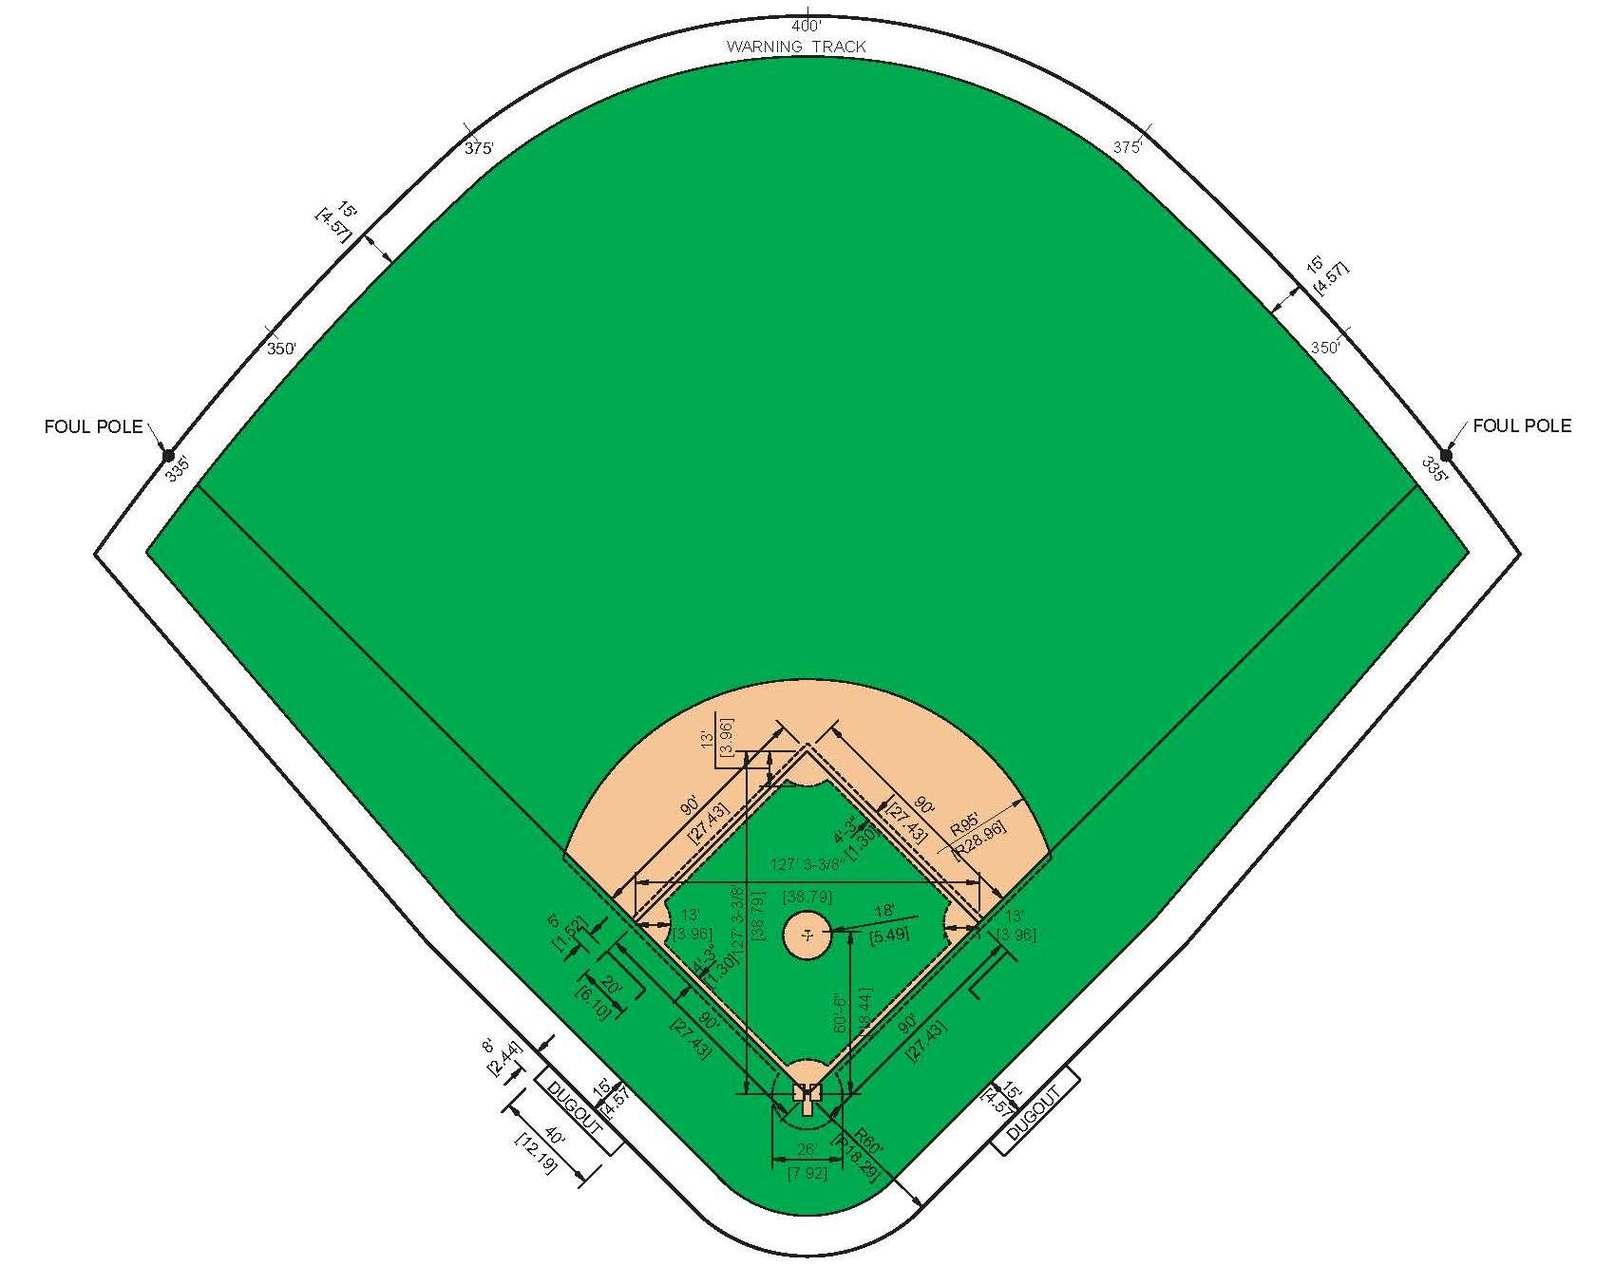 Diamond clipart softball diamond To clip cliparts Baseball template